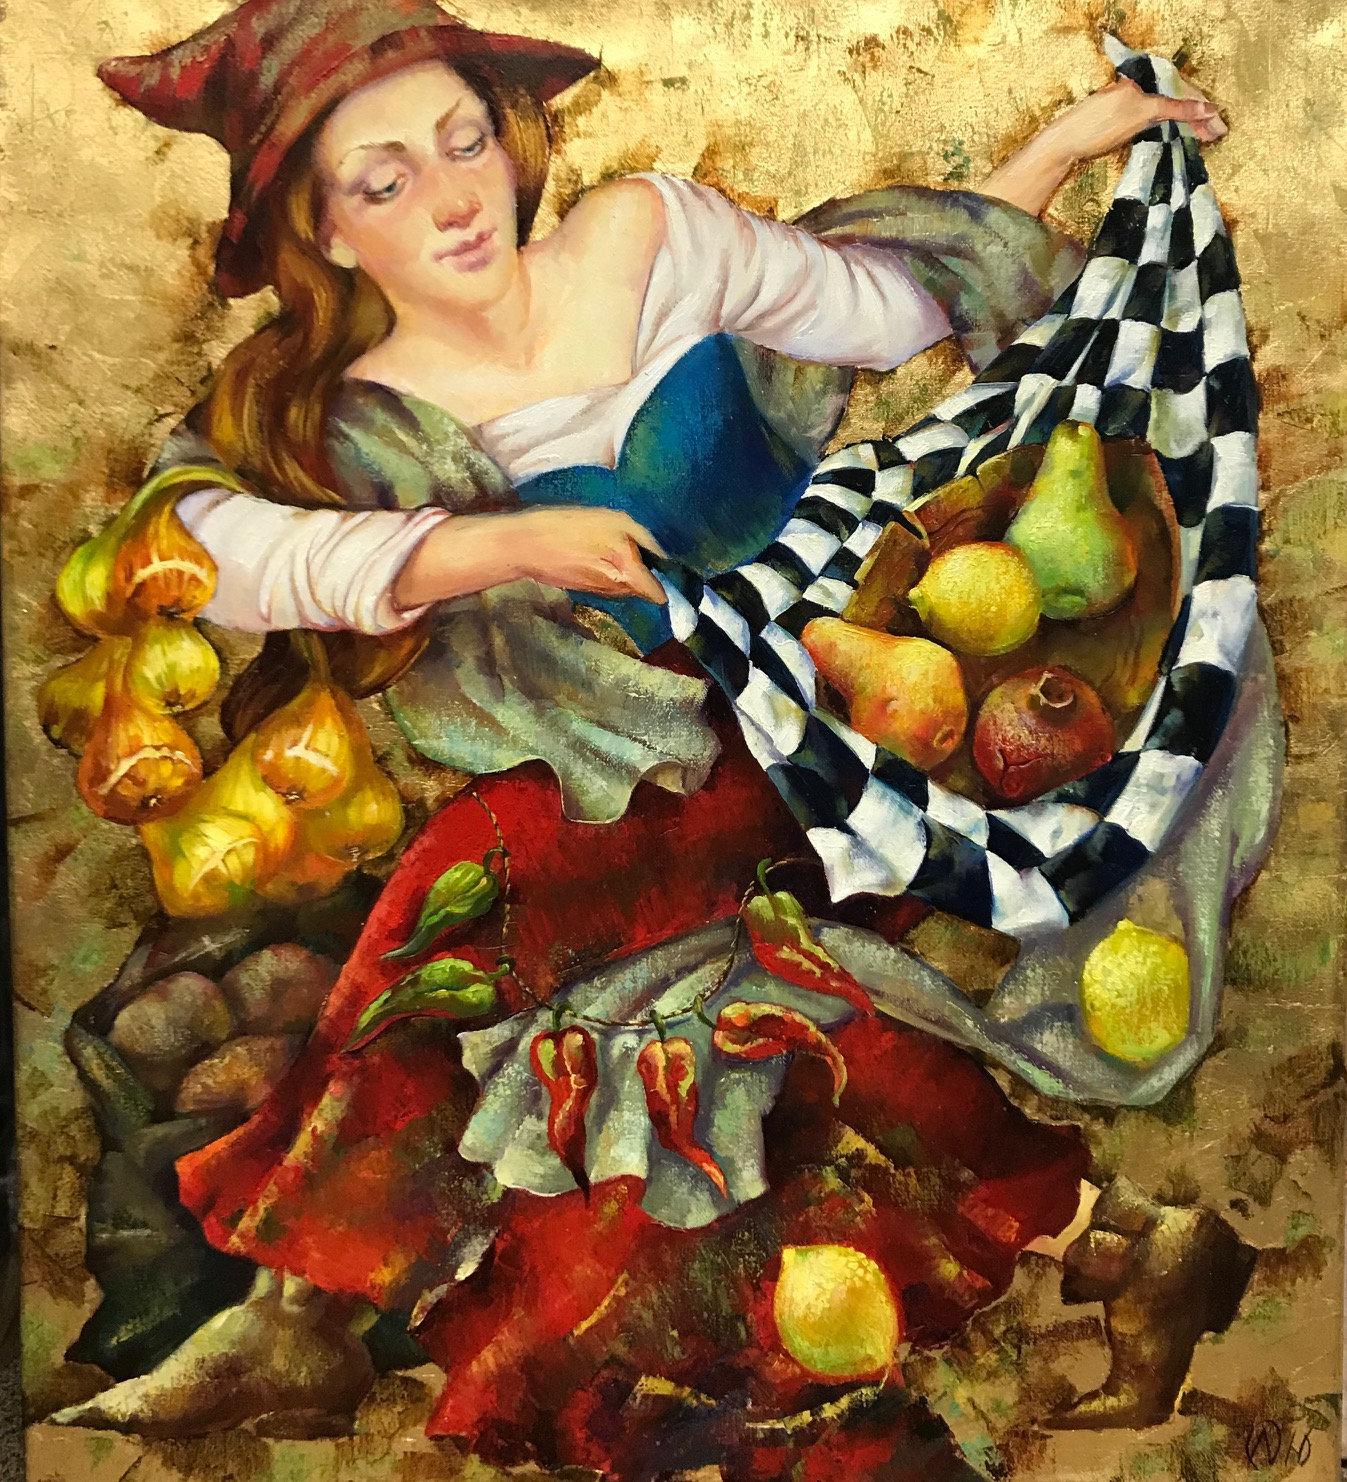 Olga Naletova, Autumn came, Oil on canvas, Signed